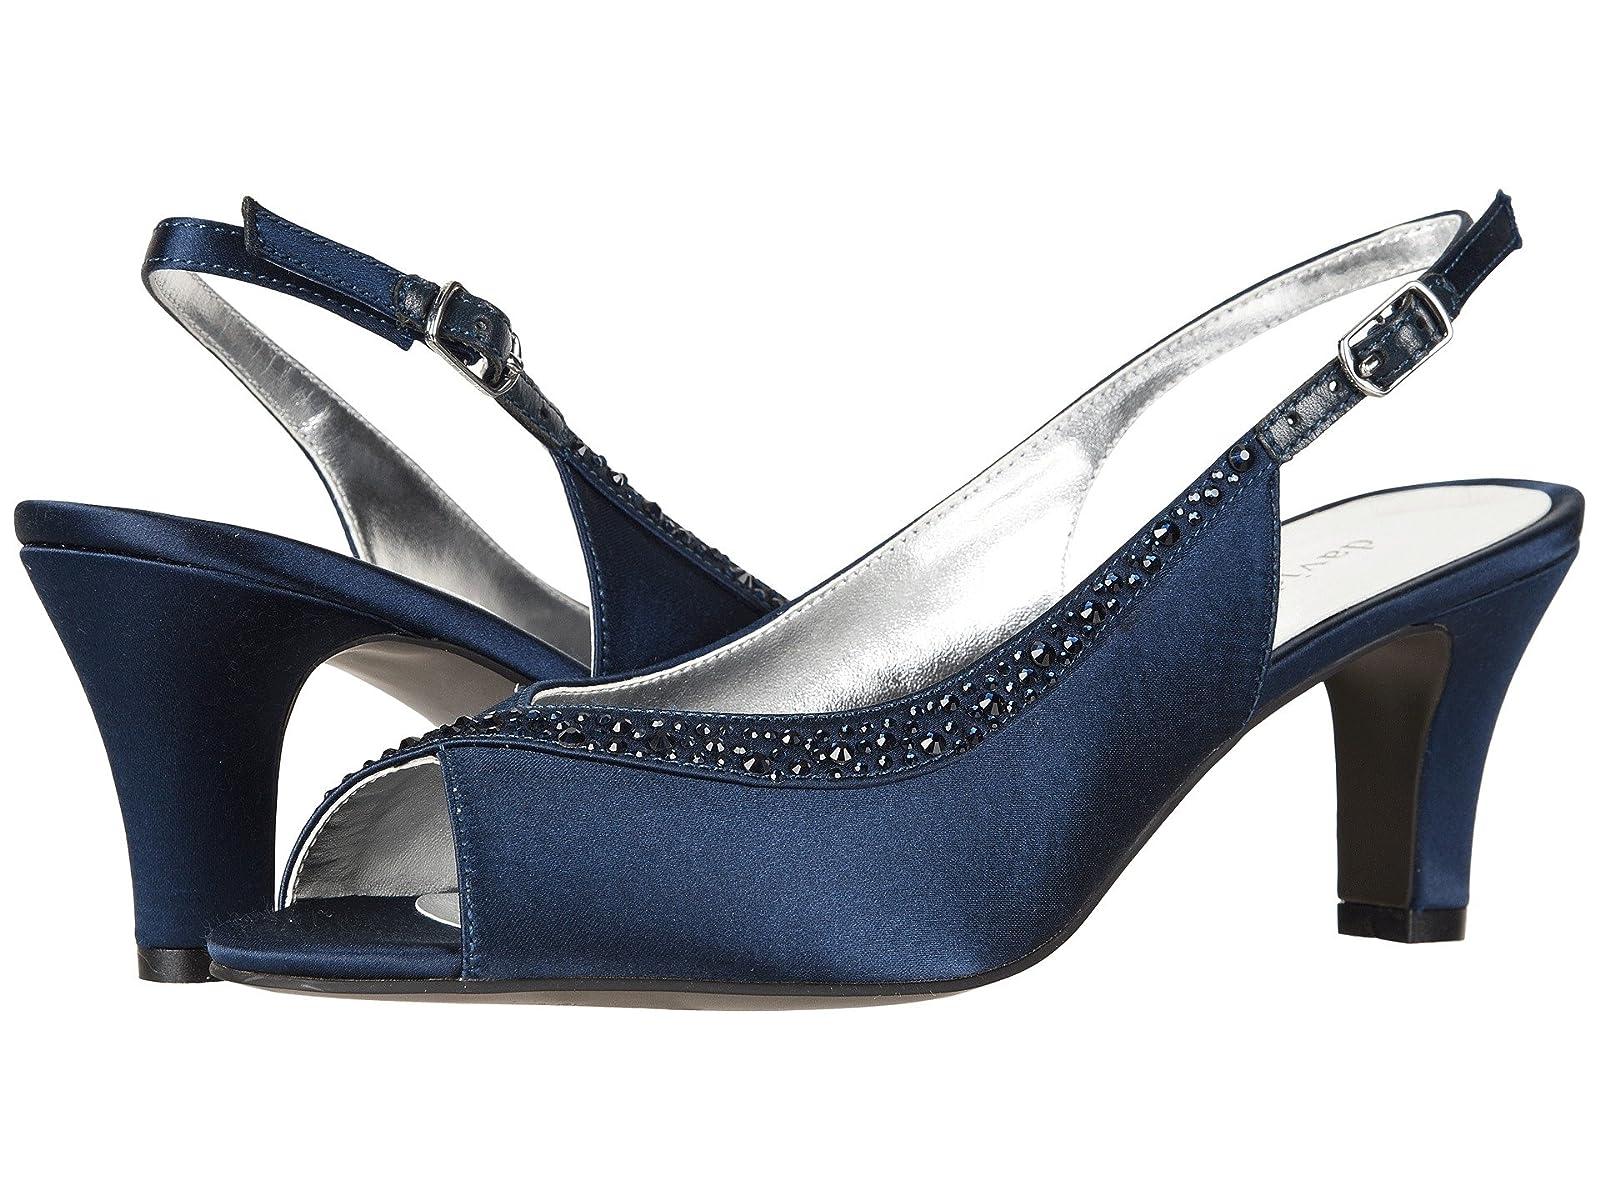 David Tate DaintyAtmospheric grades have affordable shoes